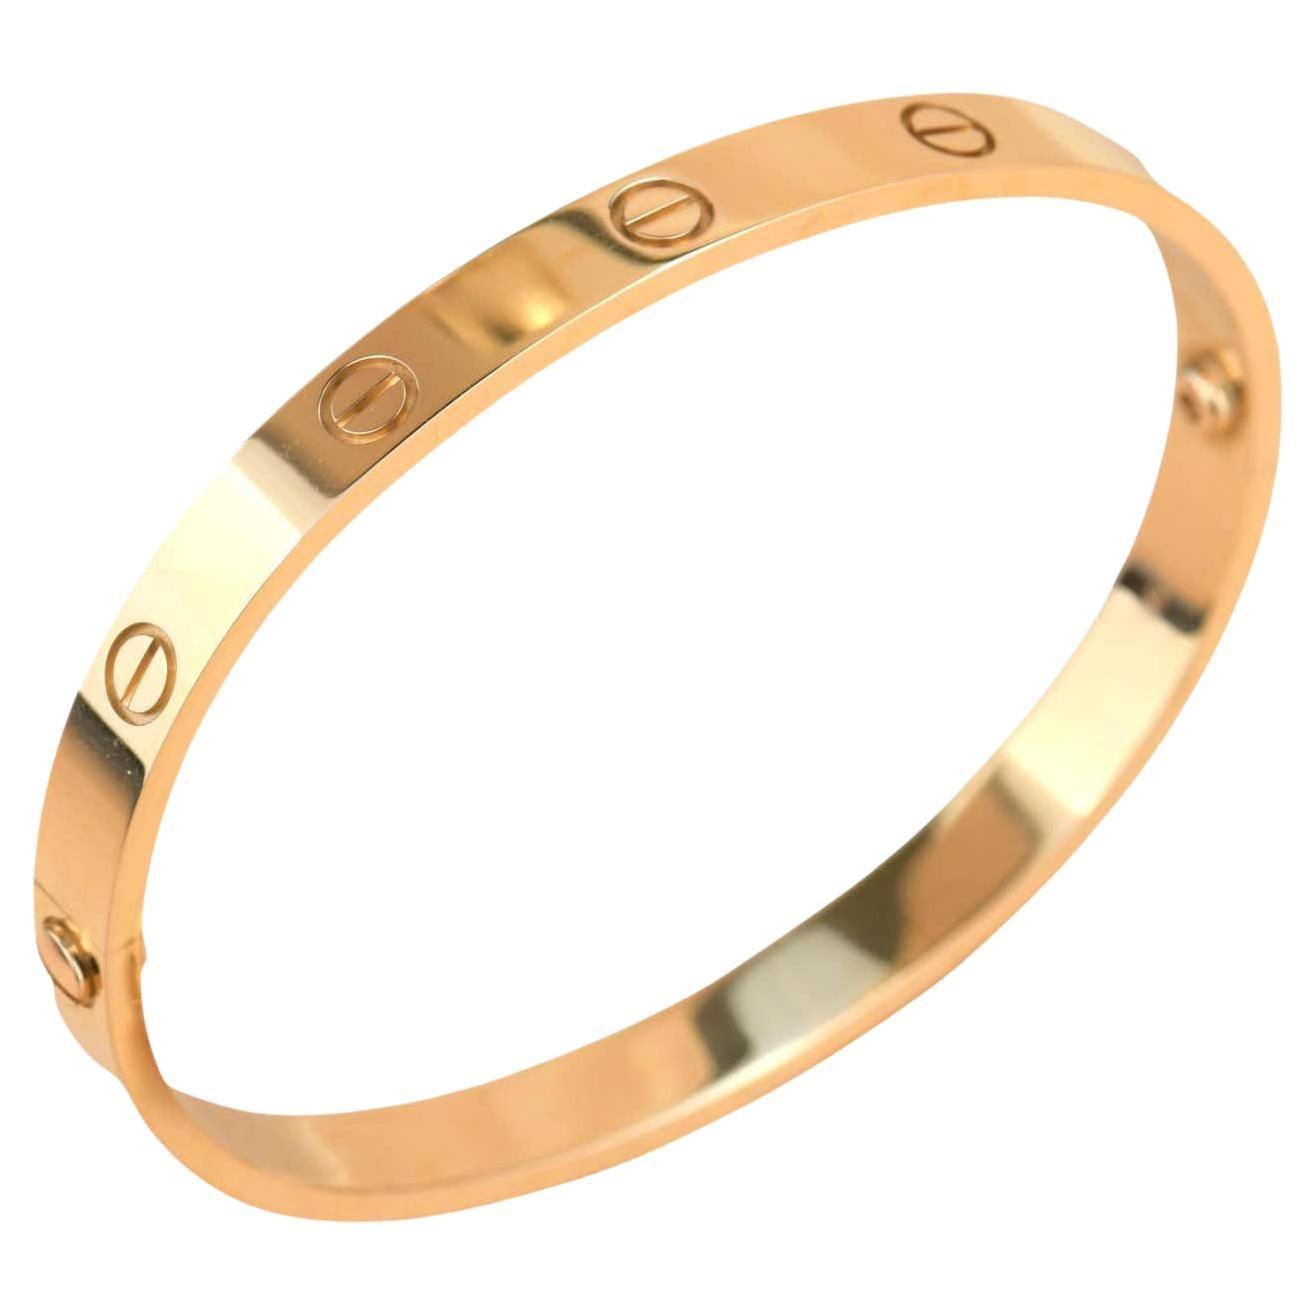 New Cartier Love 18K Rose Gold Bracelet